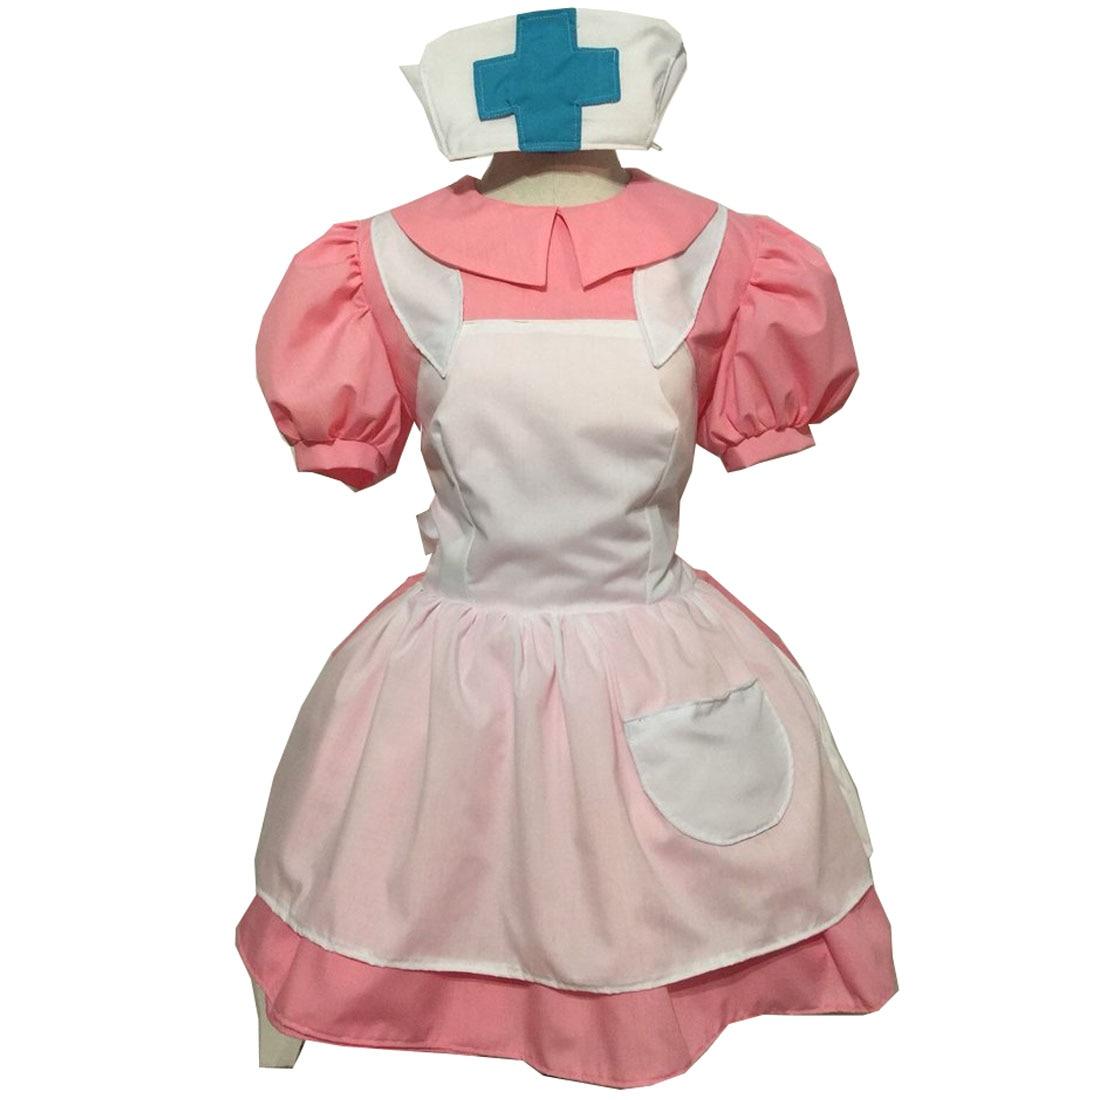 2019 Pocket Monsters Nurse Joy Cosplay Costume Dress Adult Women's Halloween Cosplay Clothing Custom Made